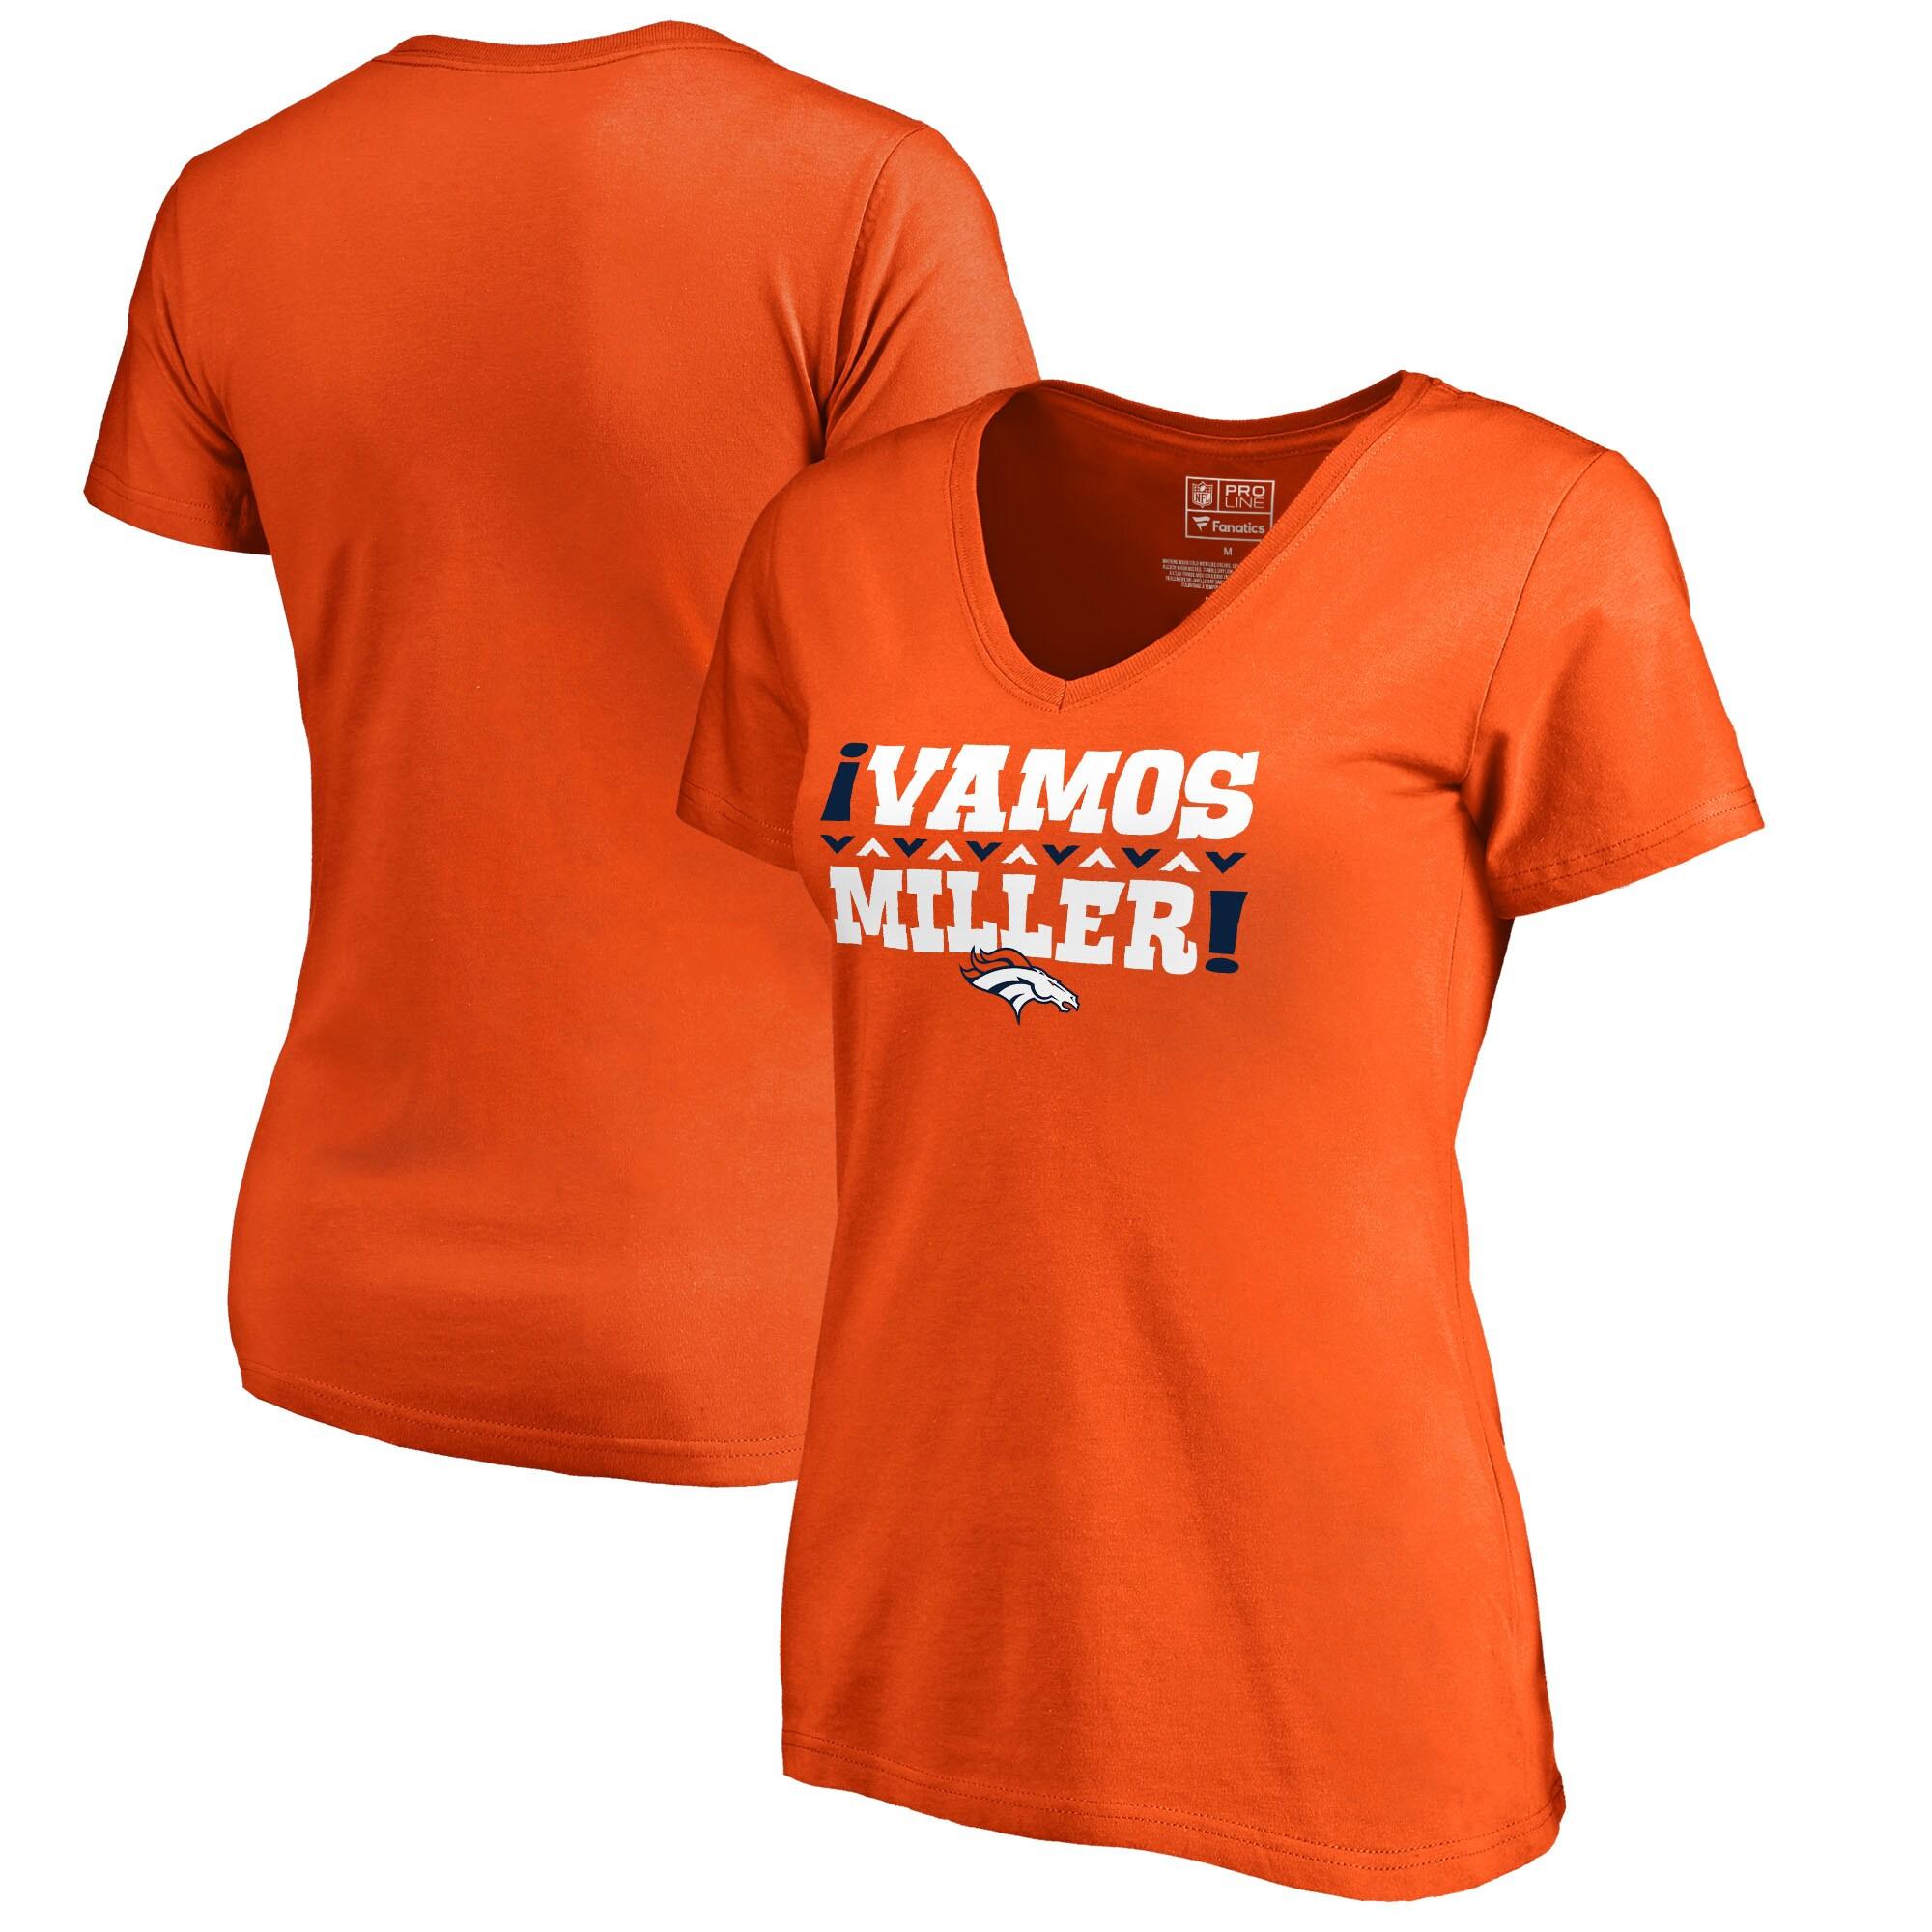 Von Miller Denver Broncos NFL Pro Line by Fanatics Branded Women's Vamos V-Neck T-Shirt - Orange